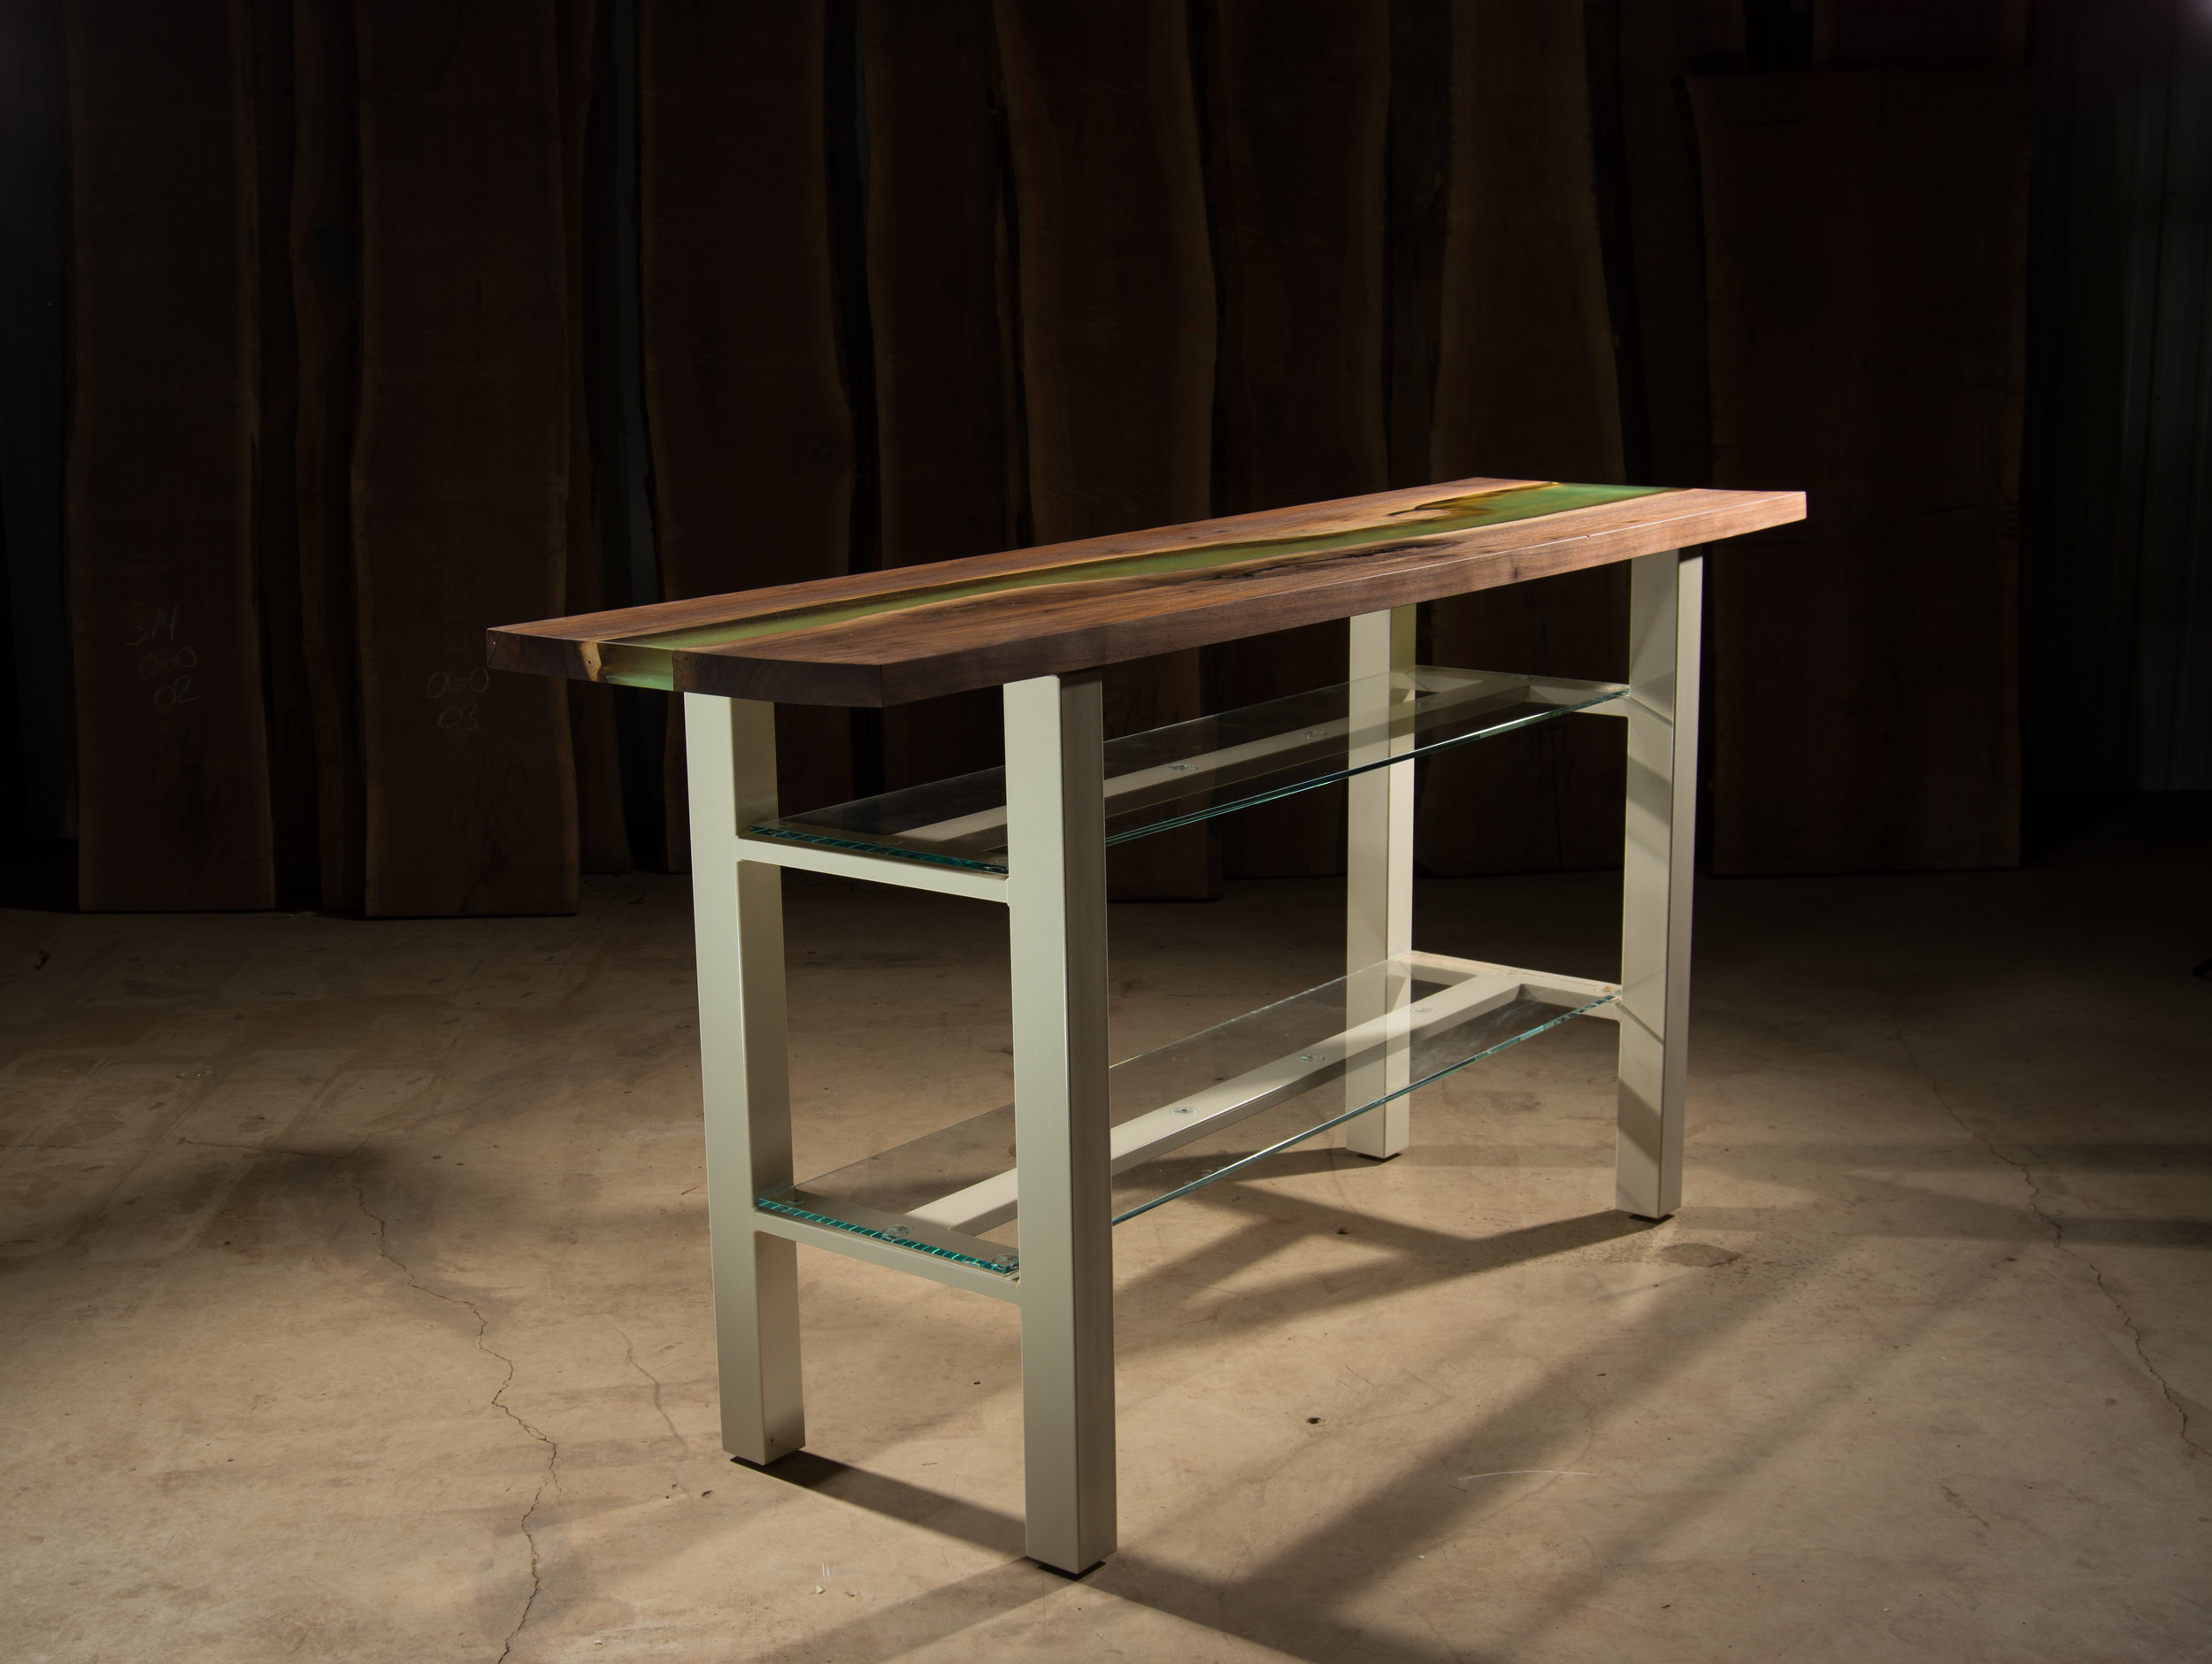 Small Bar Base W/ Glass Shelves (White Powder Coat)